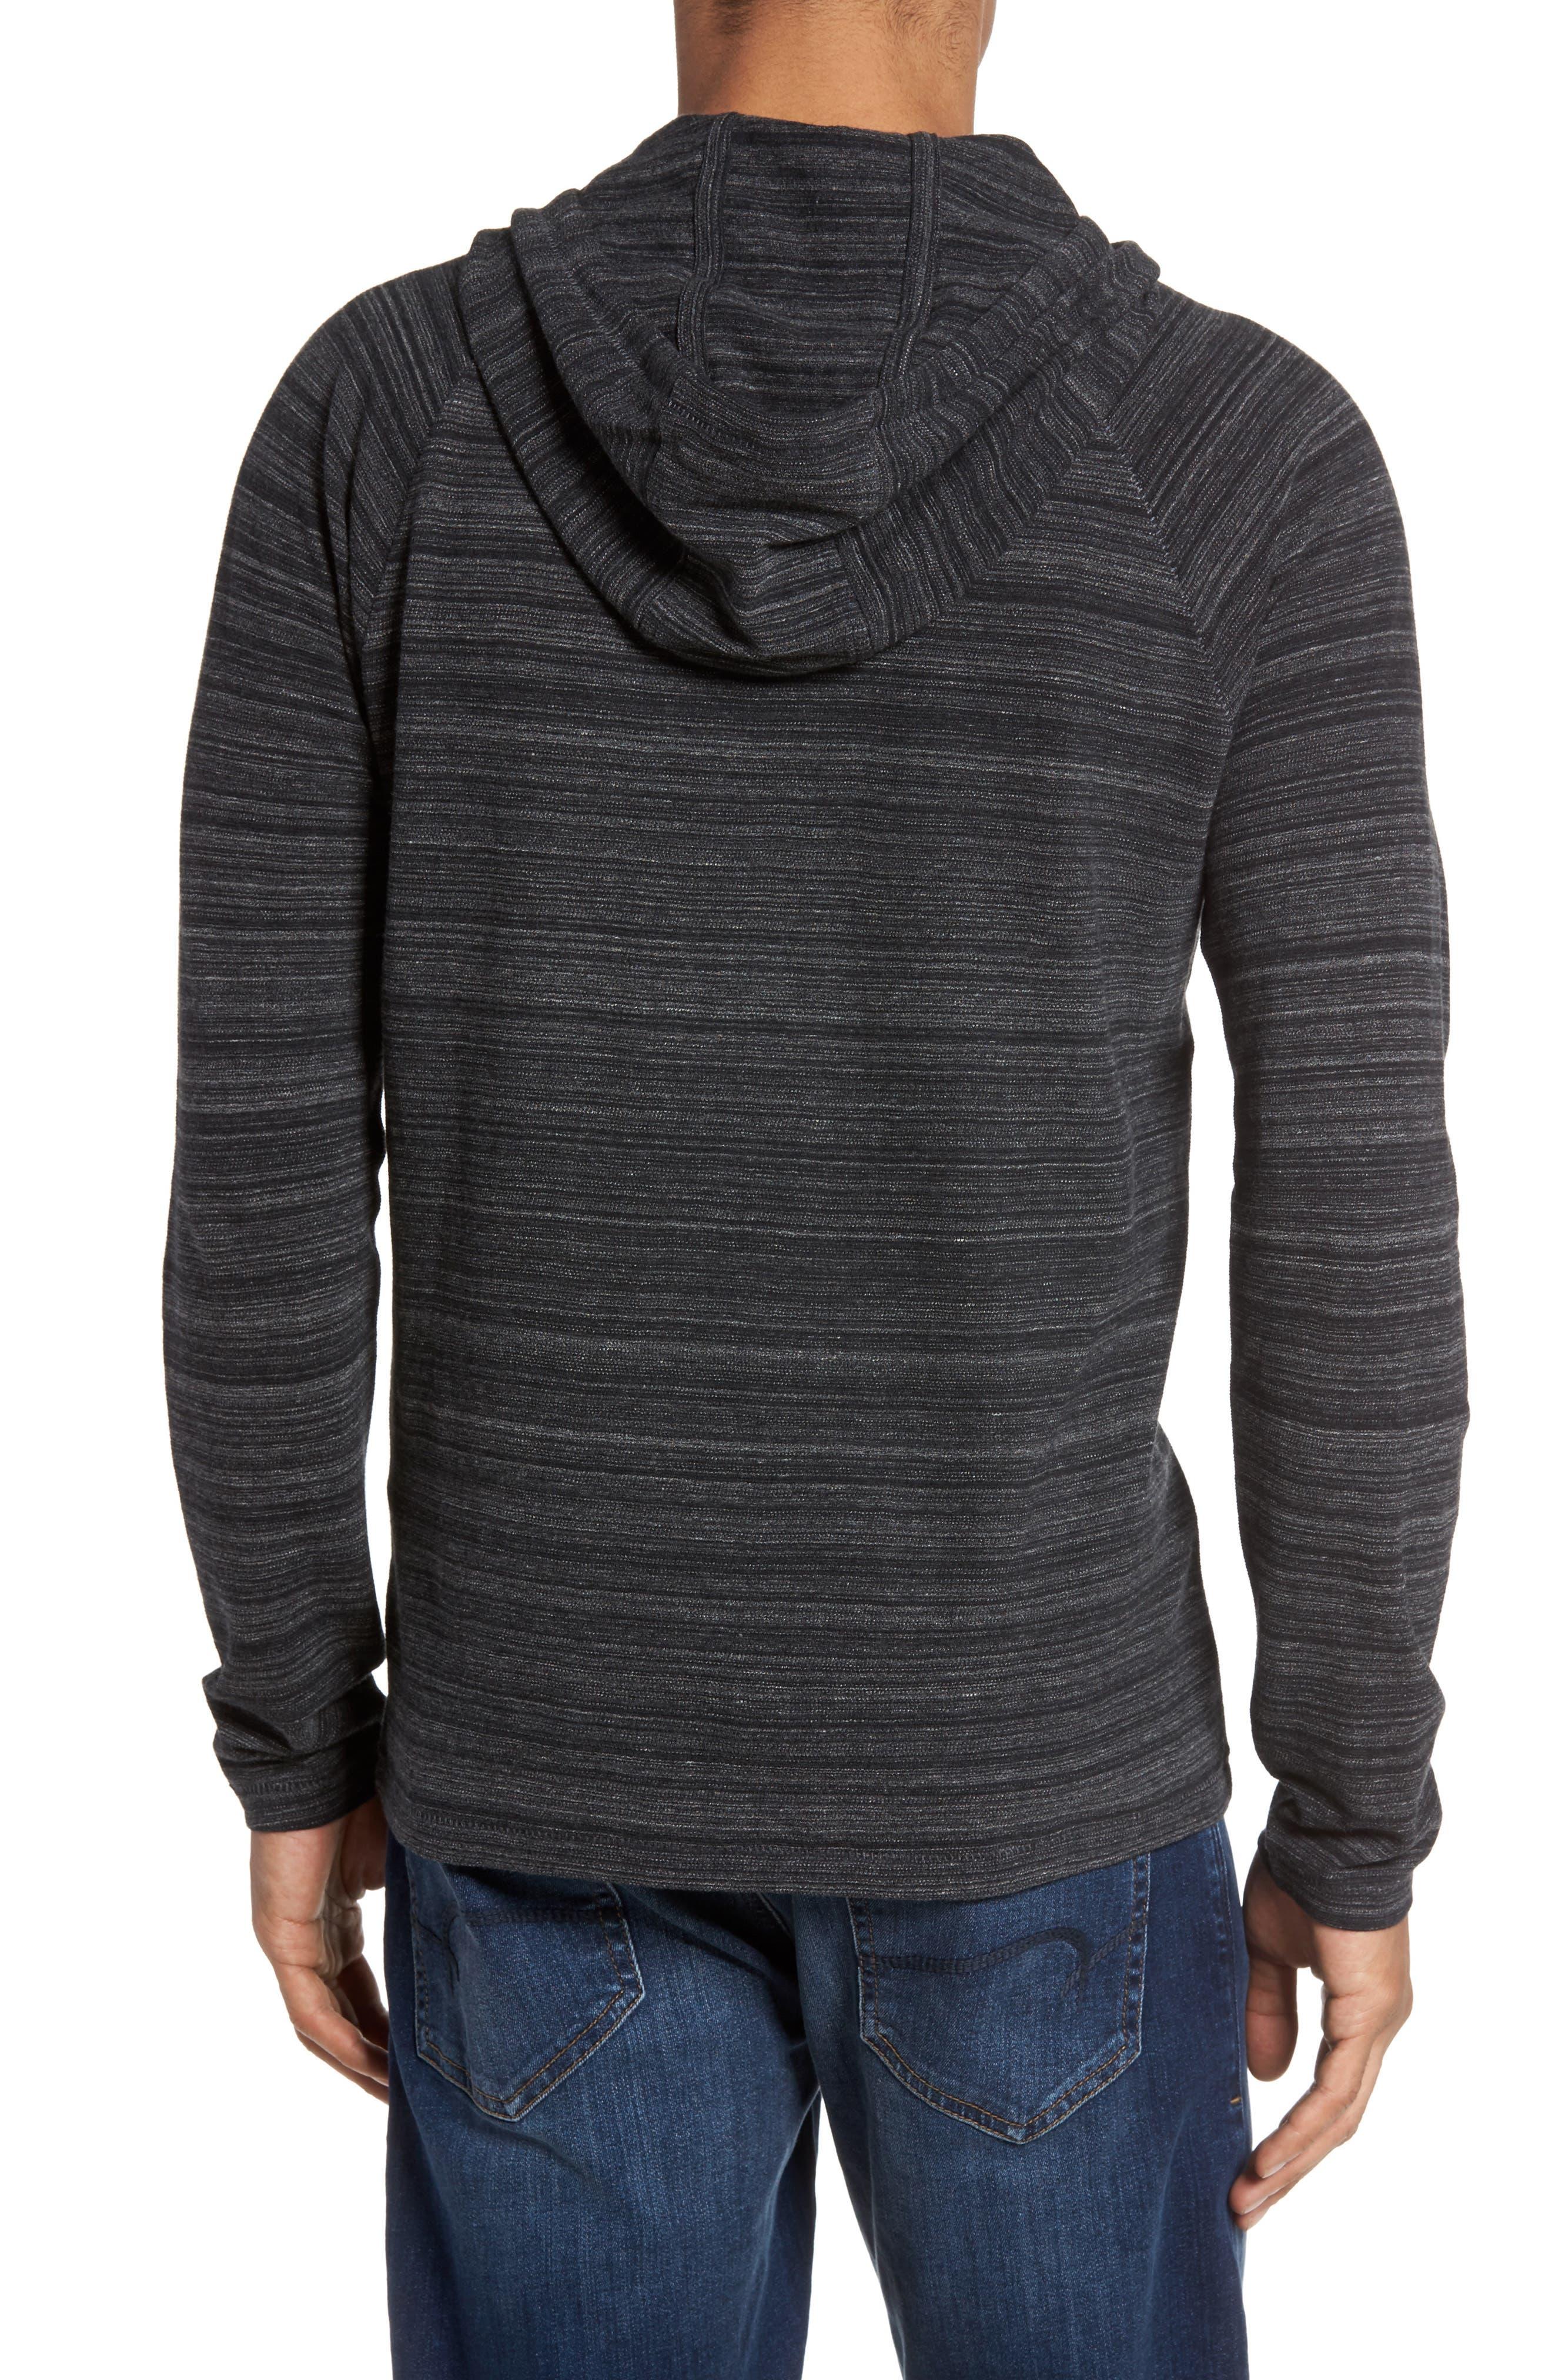 Striated Knit Hoodie,                             Alternate thumbnail 2, color,                             Black